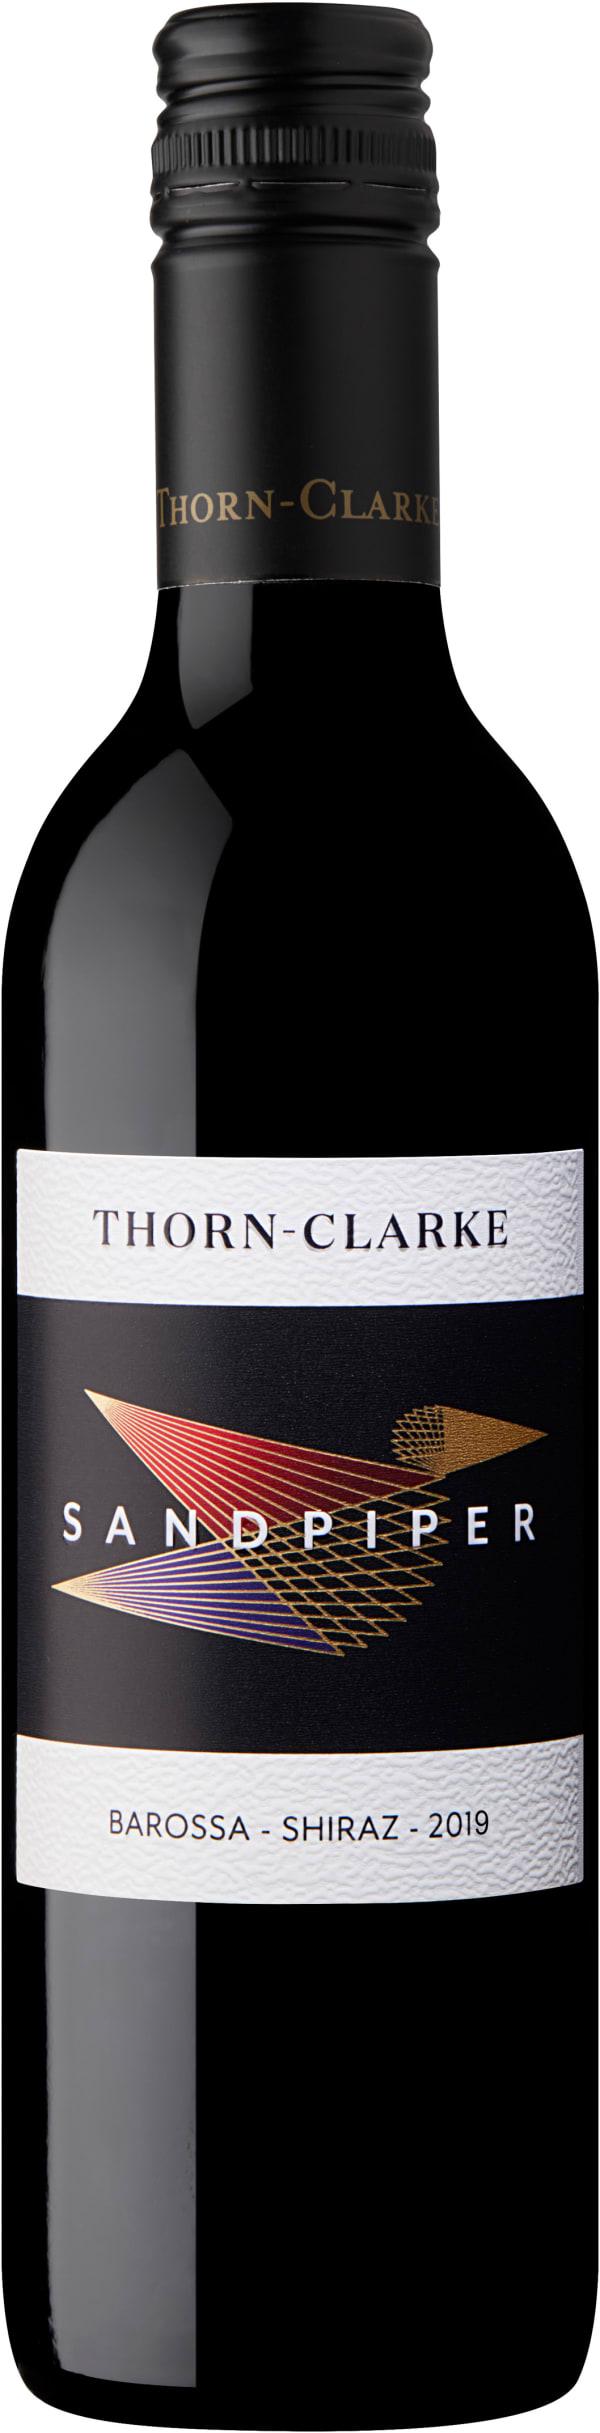 Sandpiper Barossa Shiraz 2017